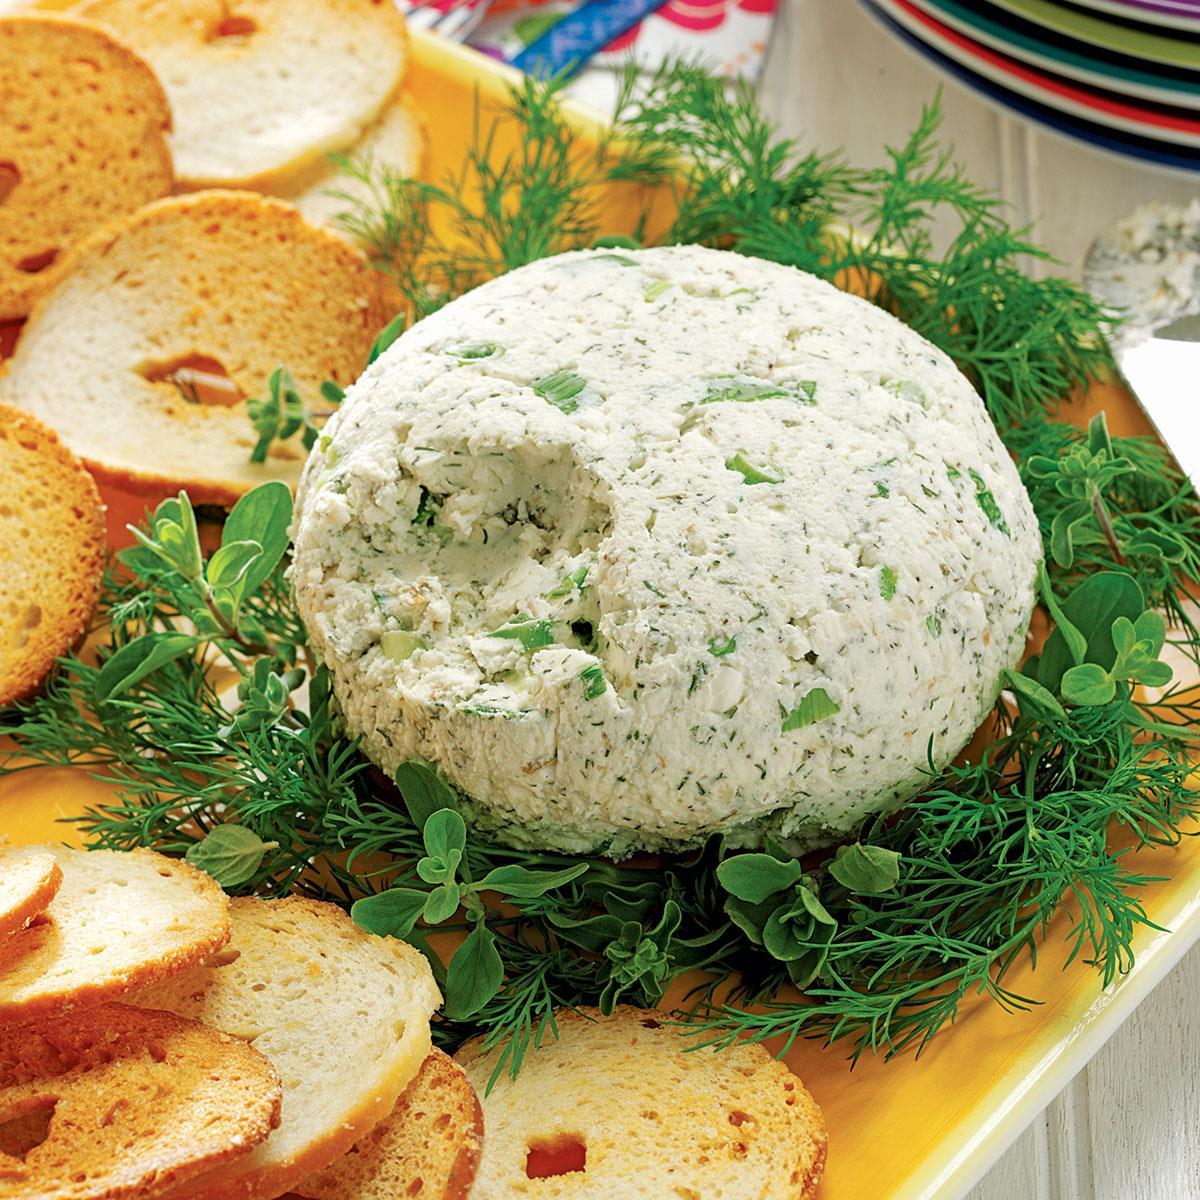 feta cheese taste